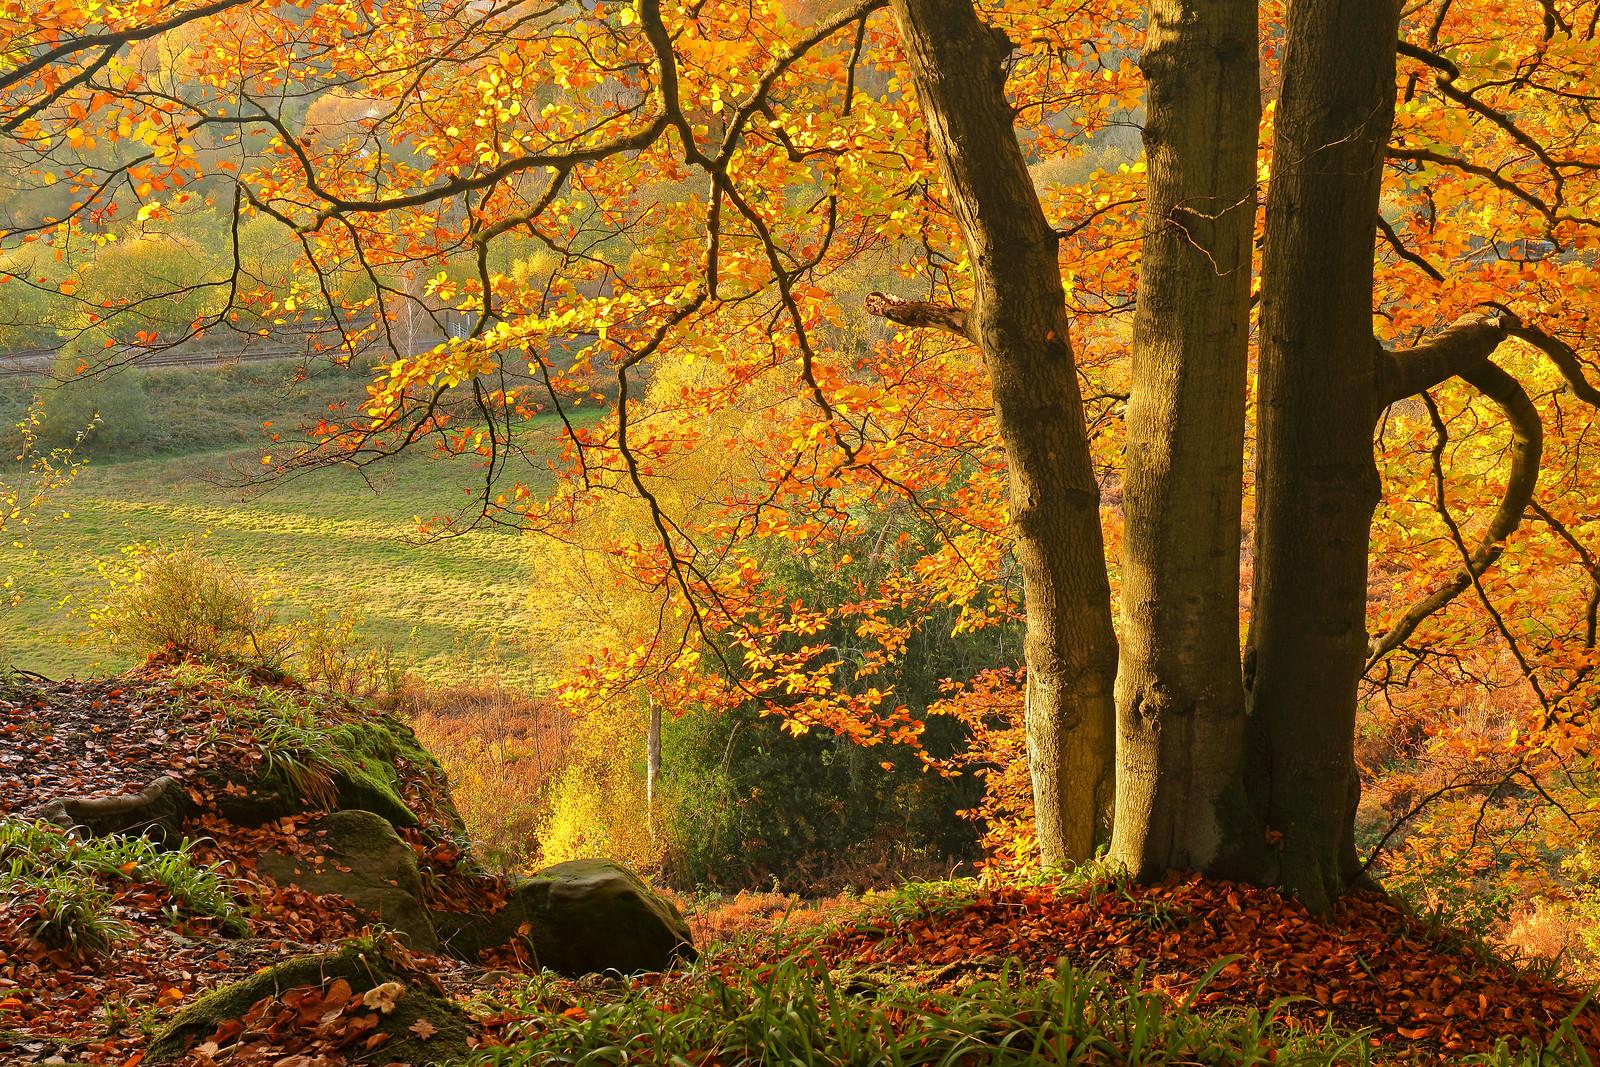 Beech Tree in November Colour